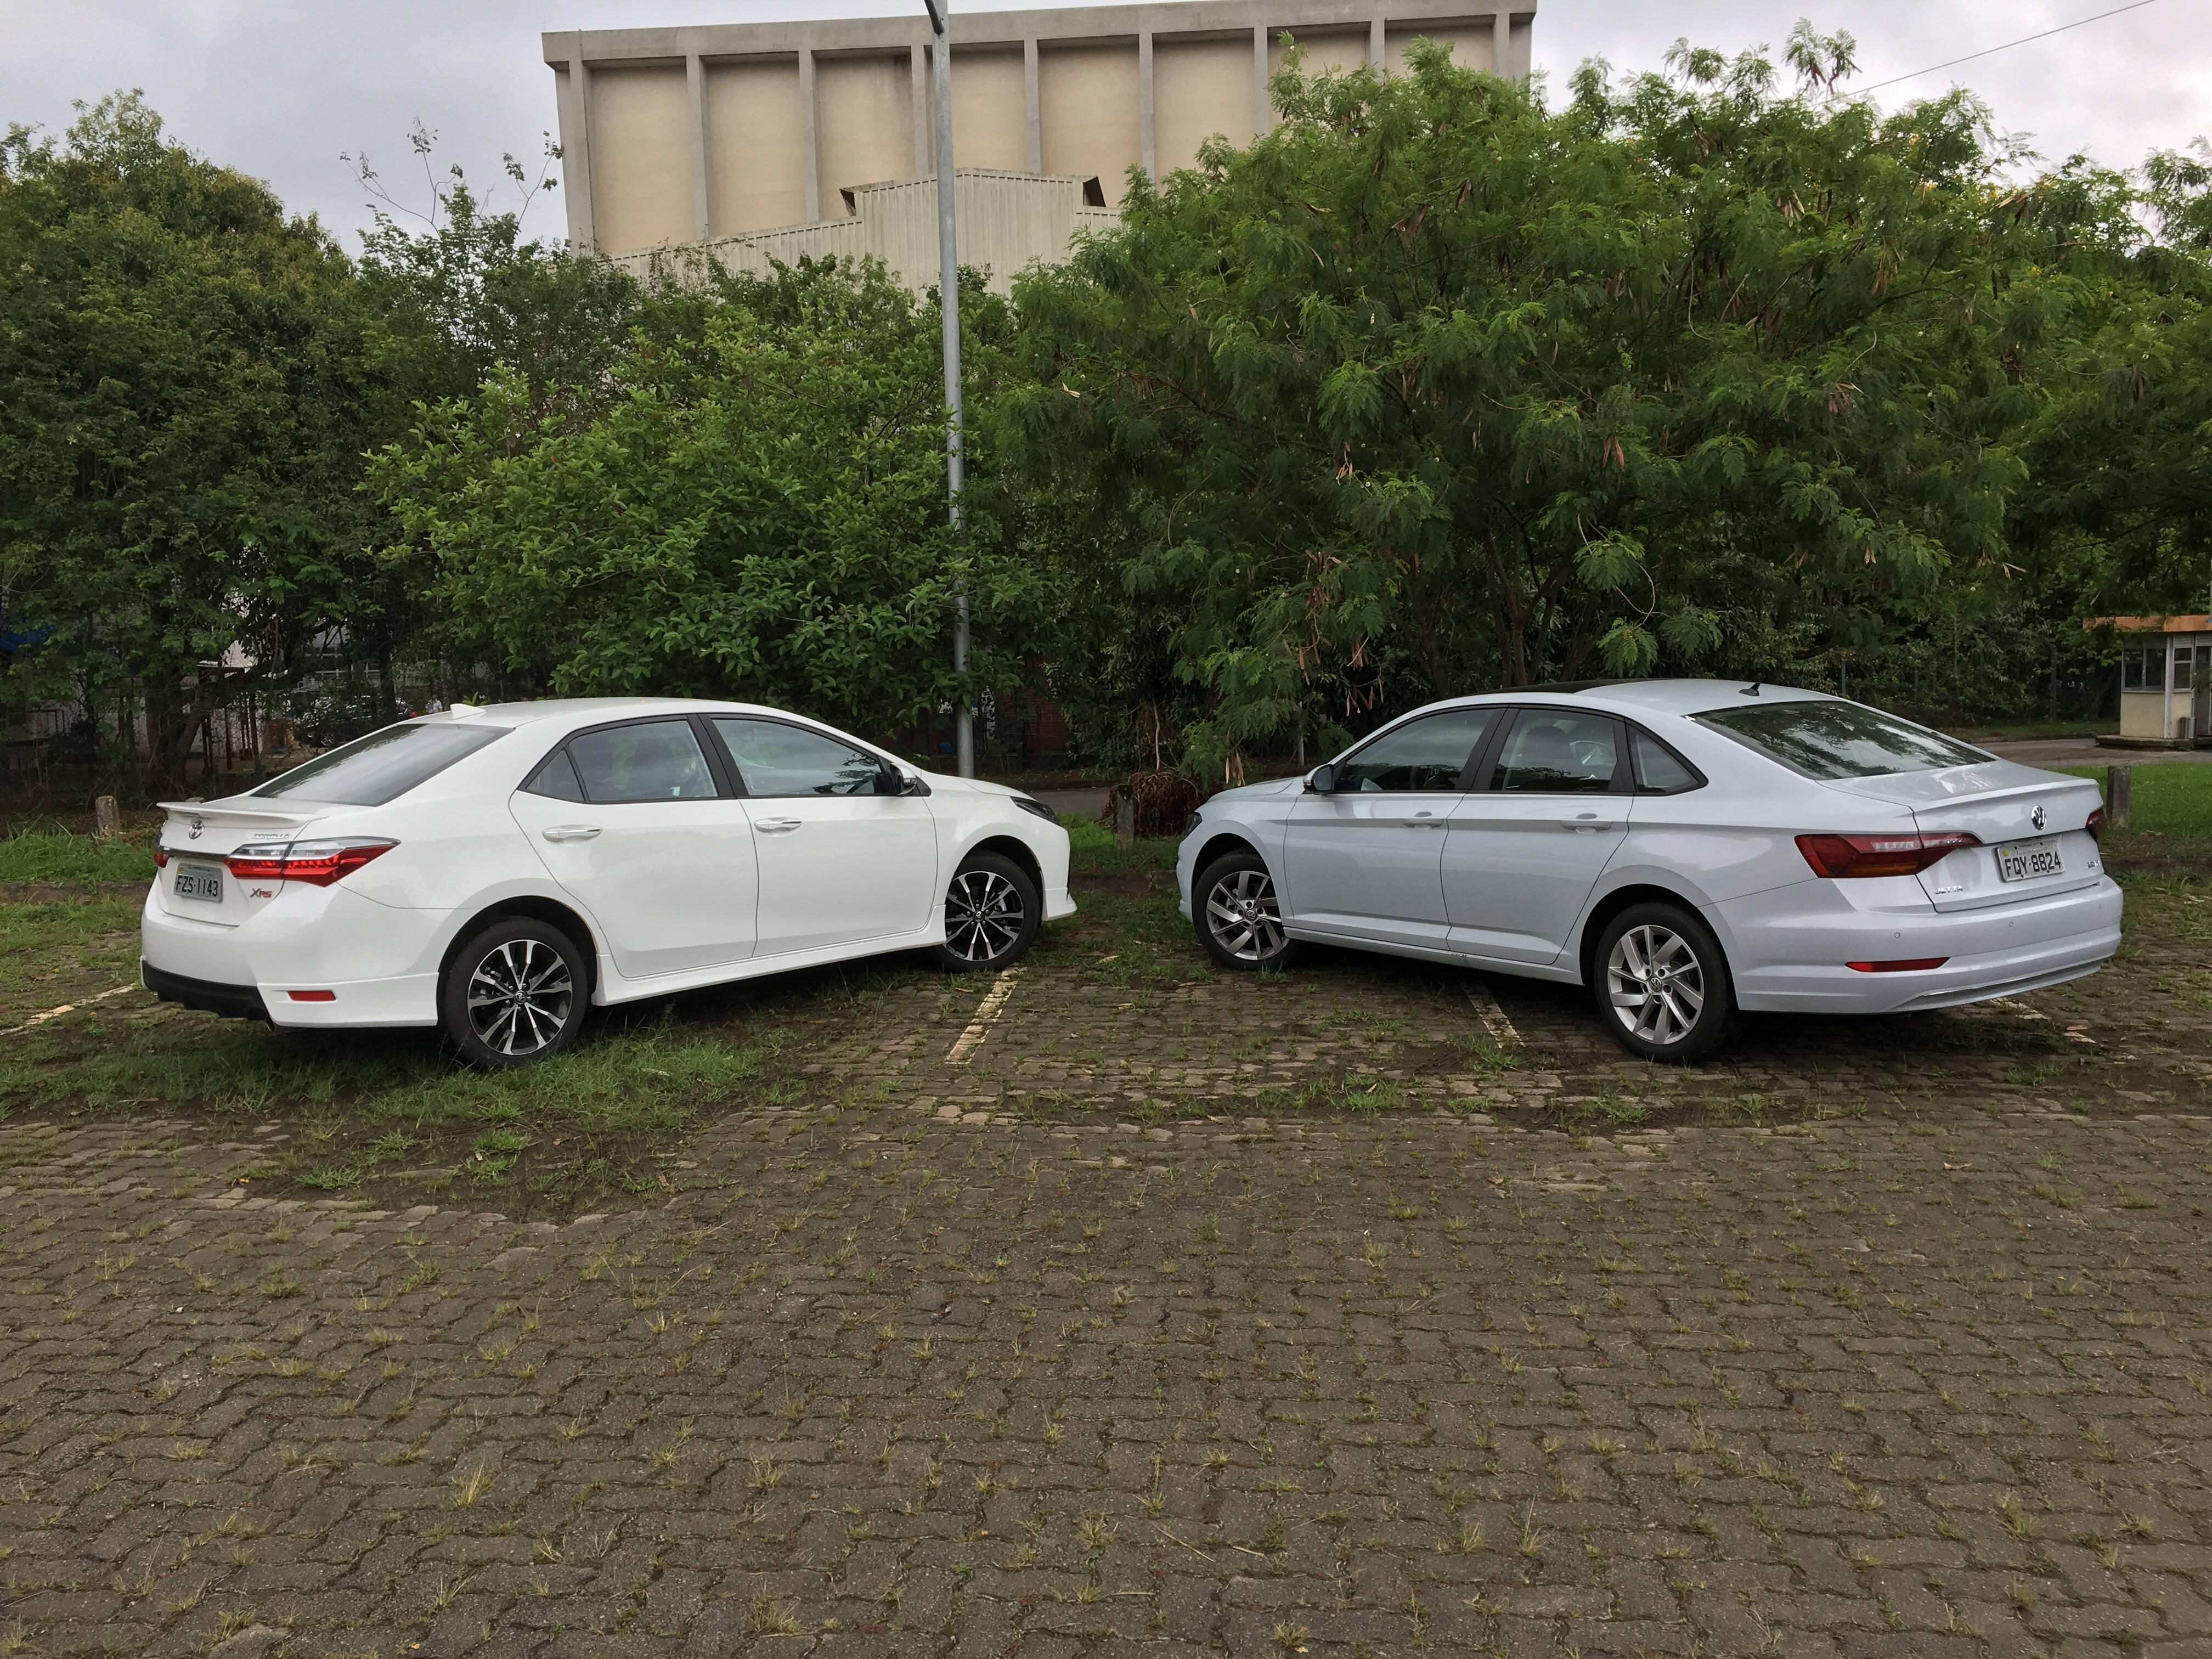 VW Jetta e Toyota Corolla. Foto: Guilherme Menezes/iG